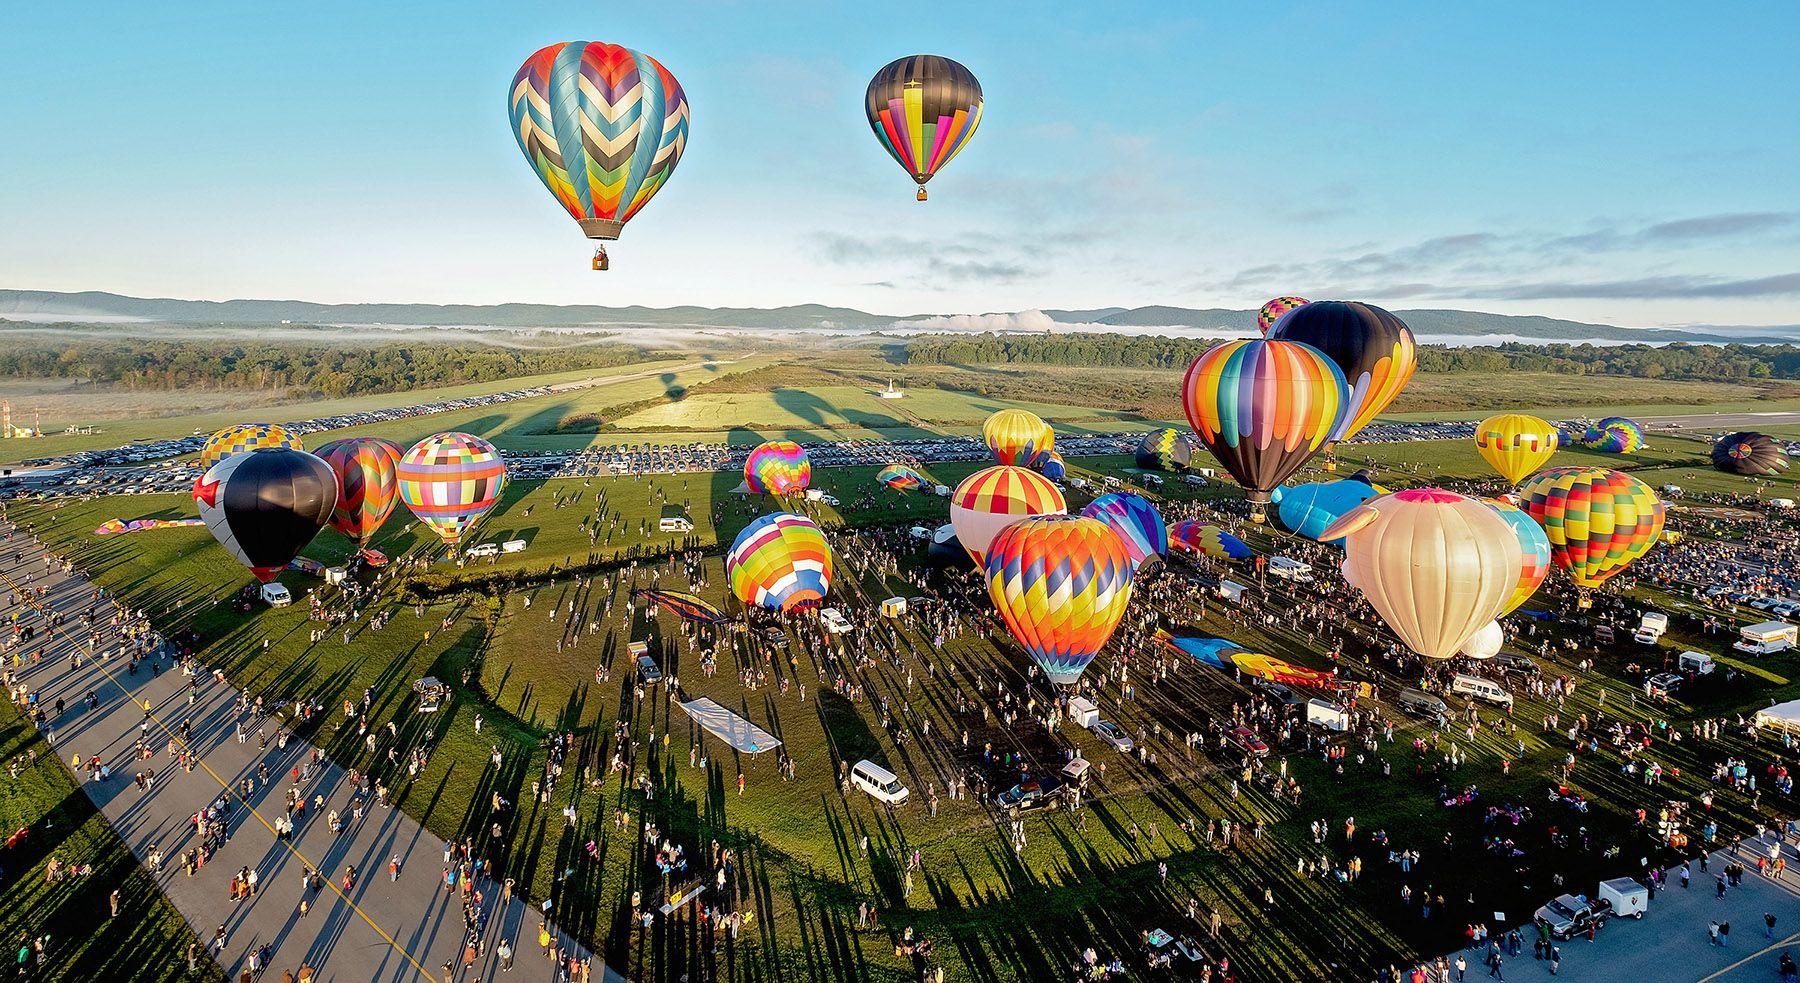 ADIRONDACK BALLOON FESTIVAL Air balloon festival